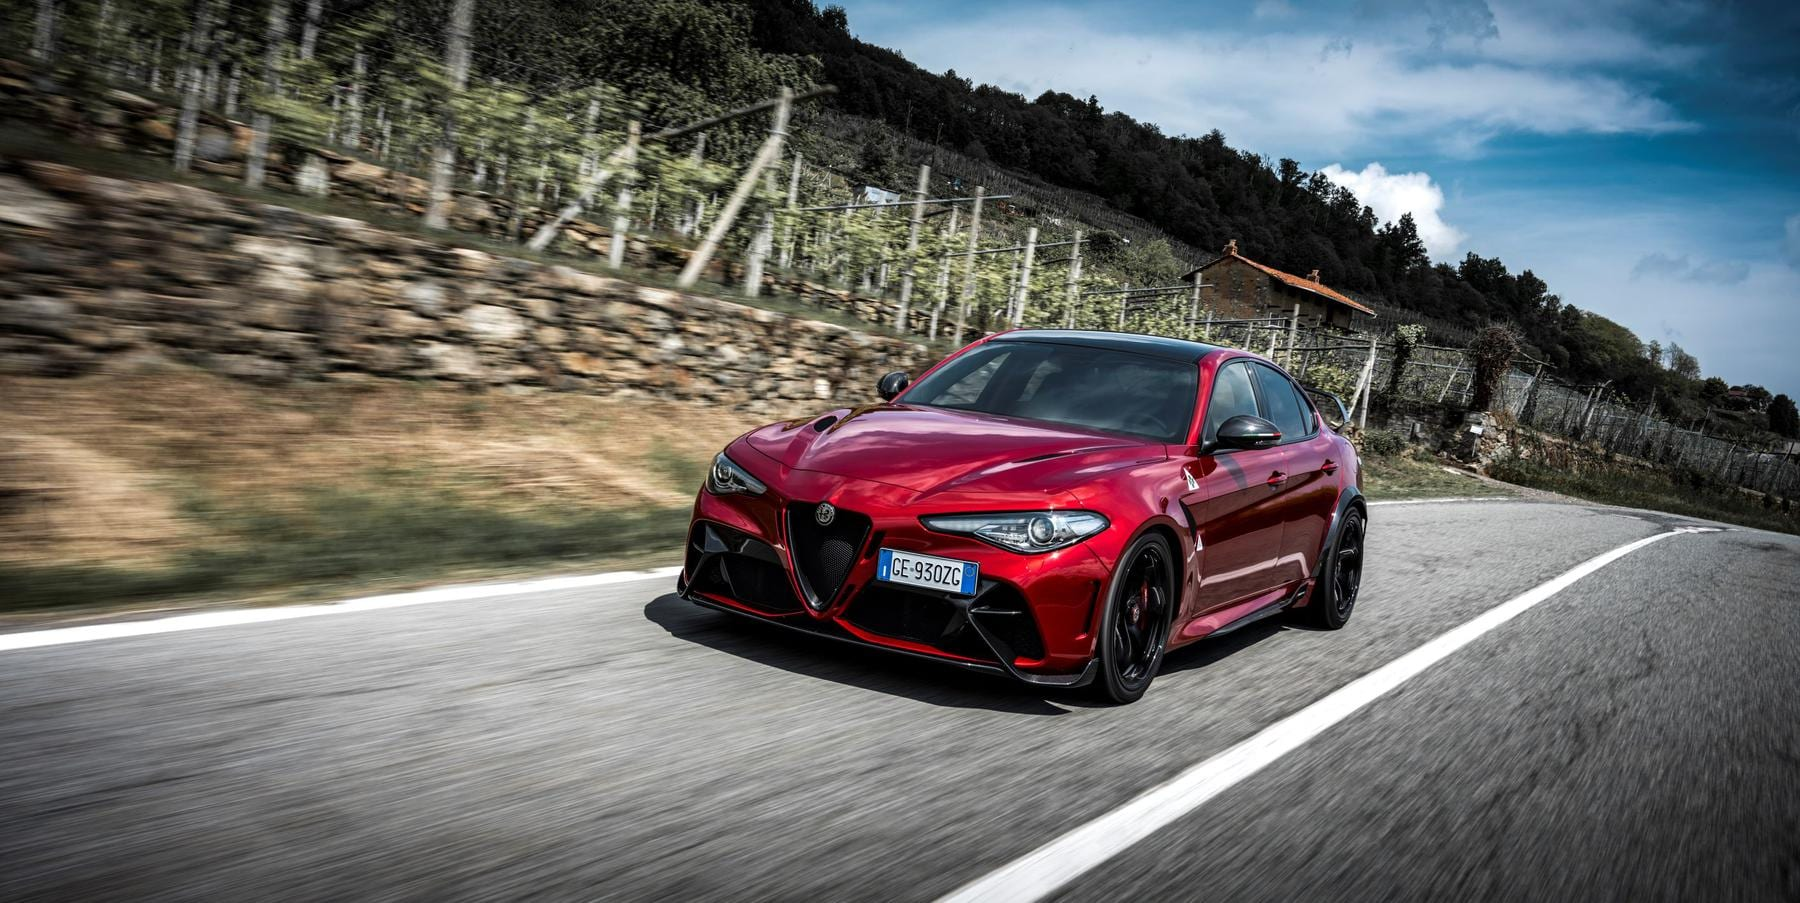 SA order books now open for Alfa Romeo's limited Giulia GTA and GTAm versions